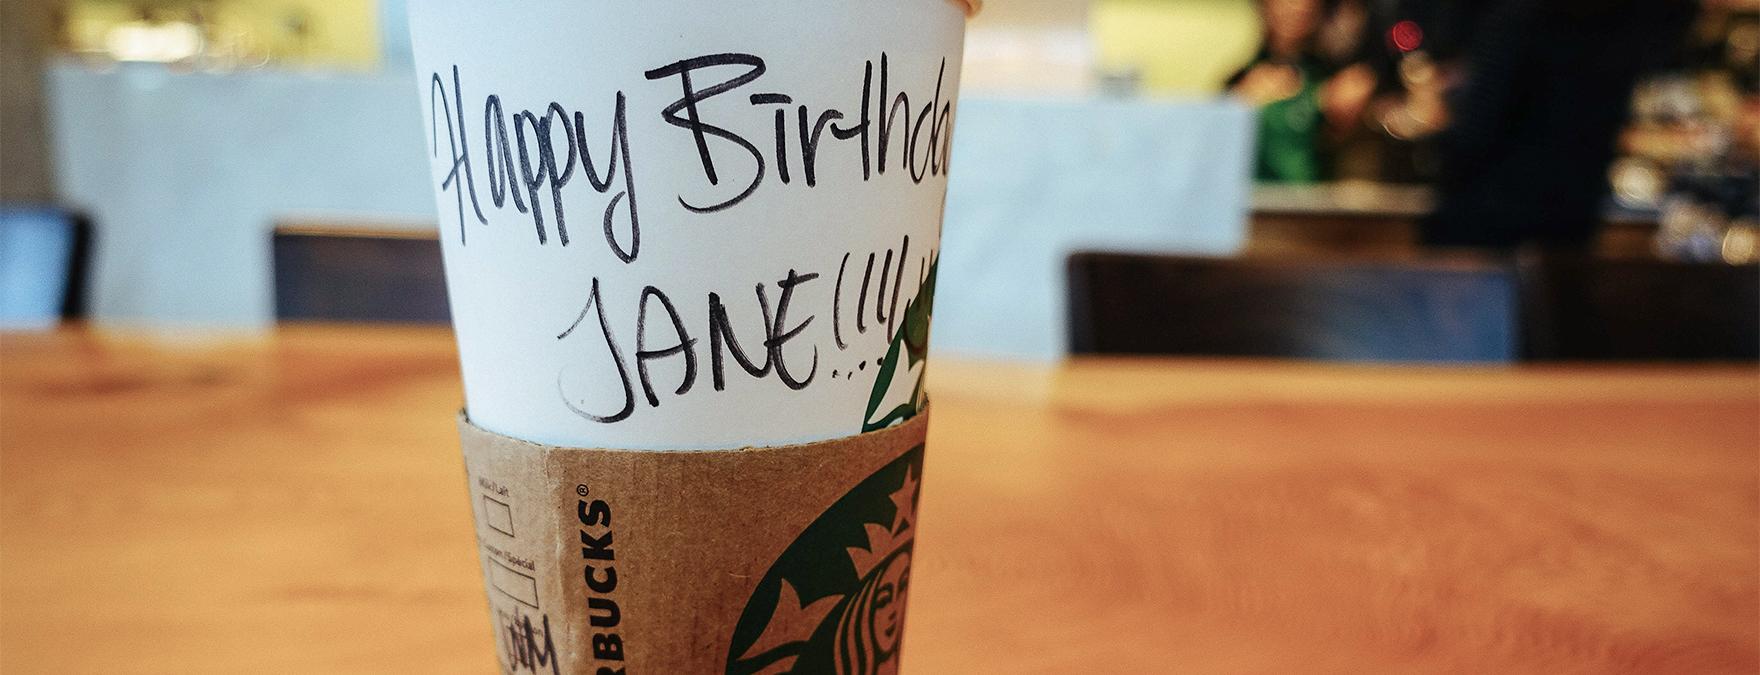 Starbucks birthday reward